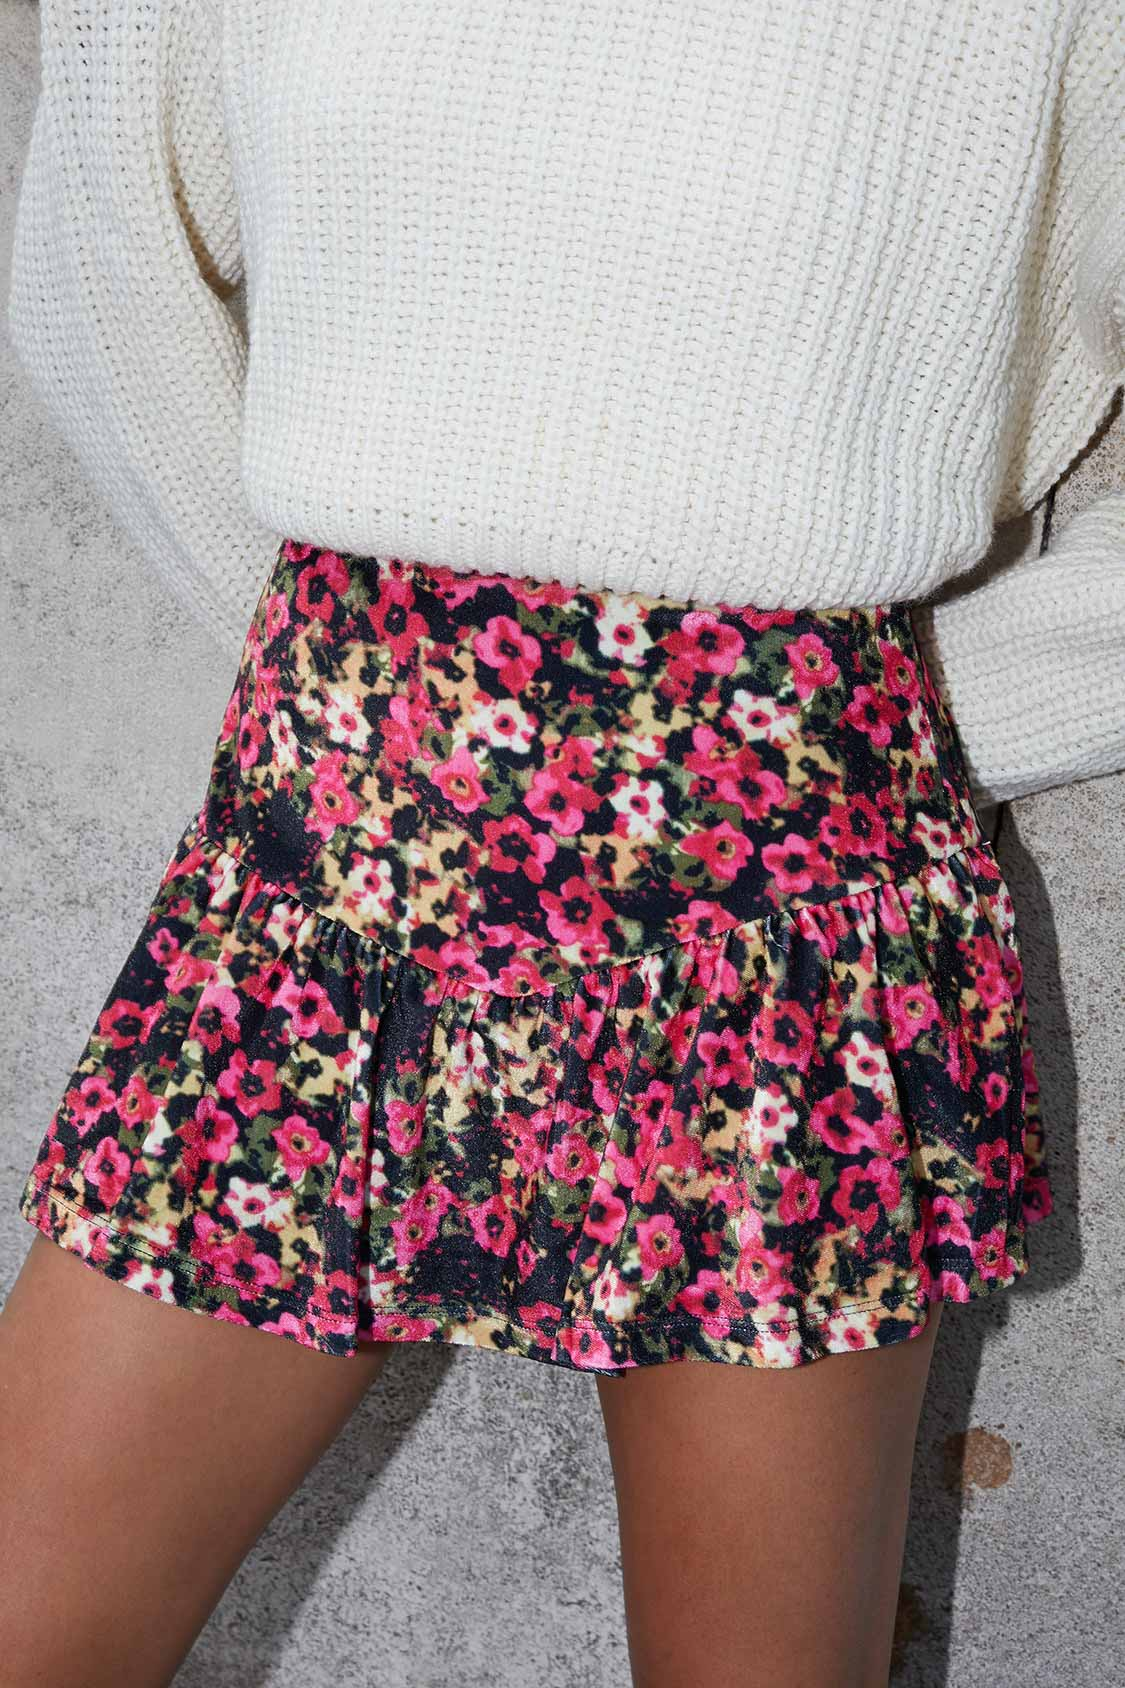 Velvet culottes shorts